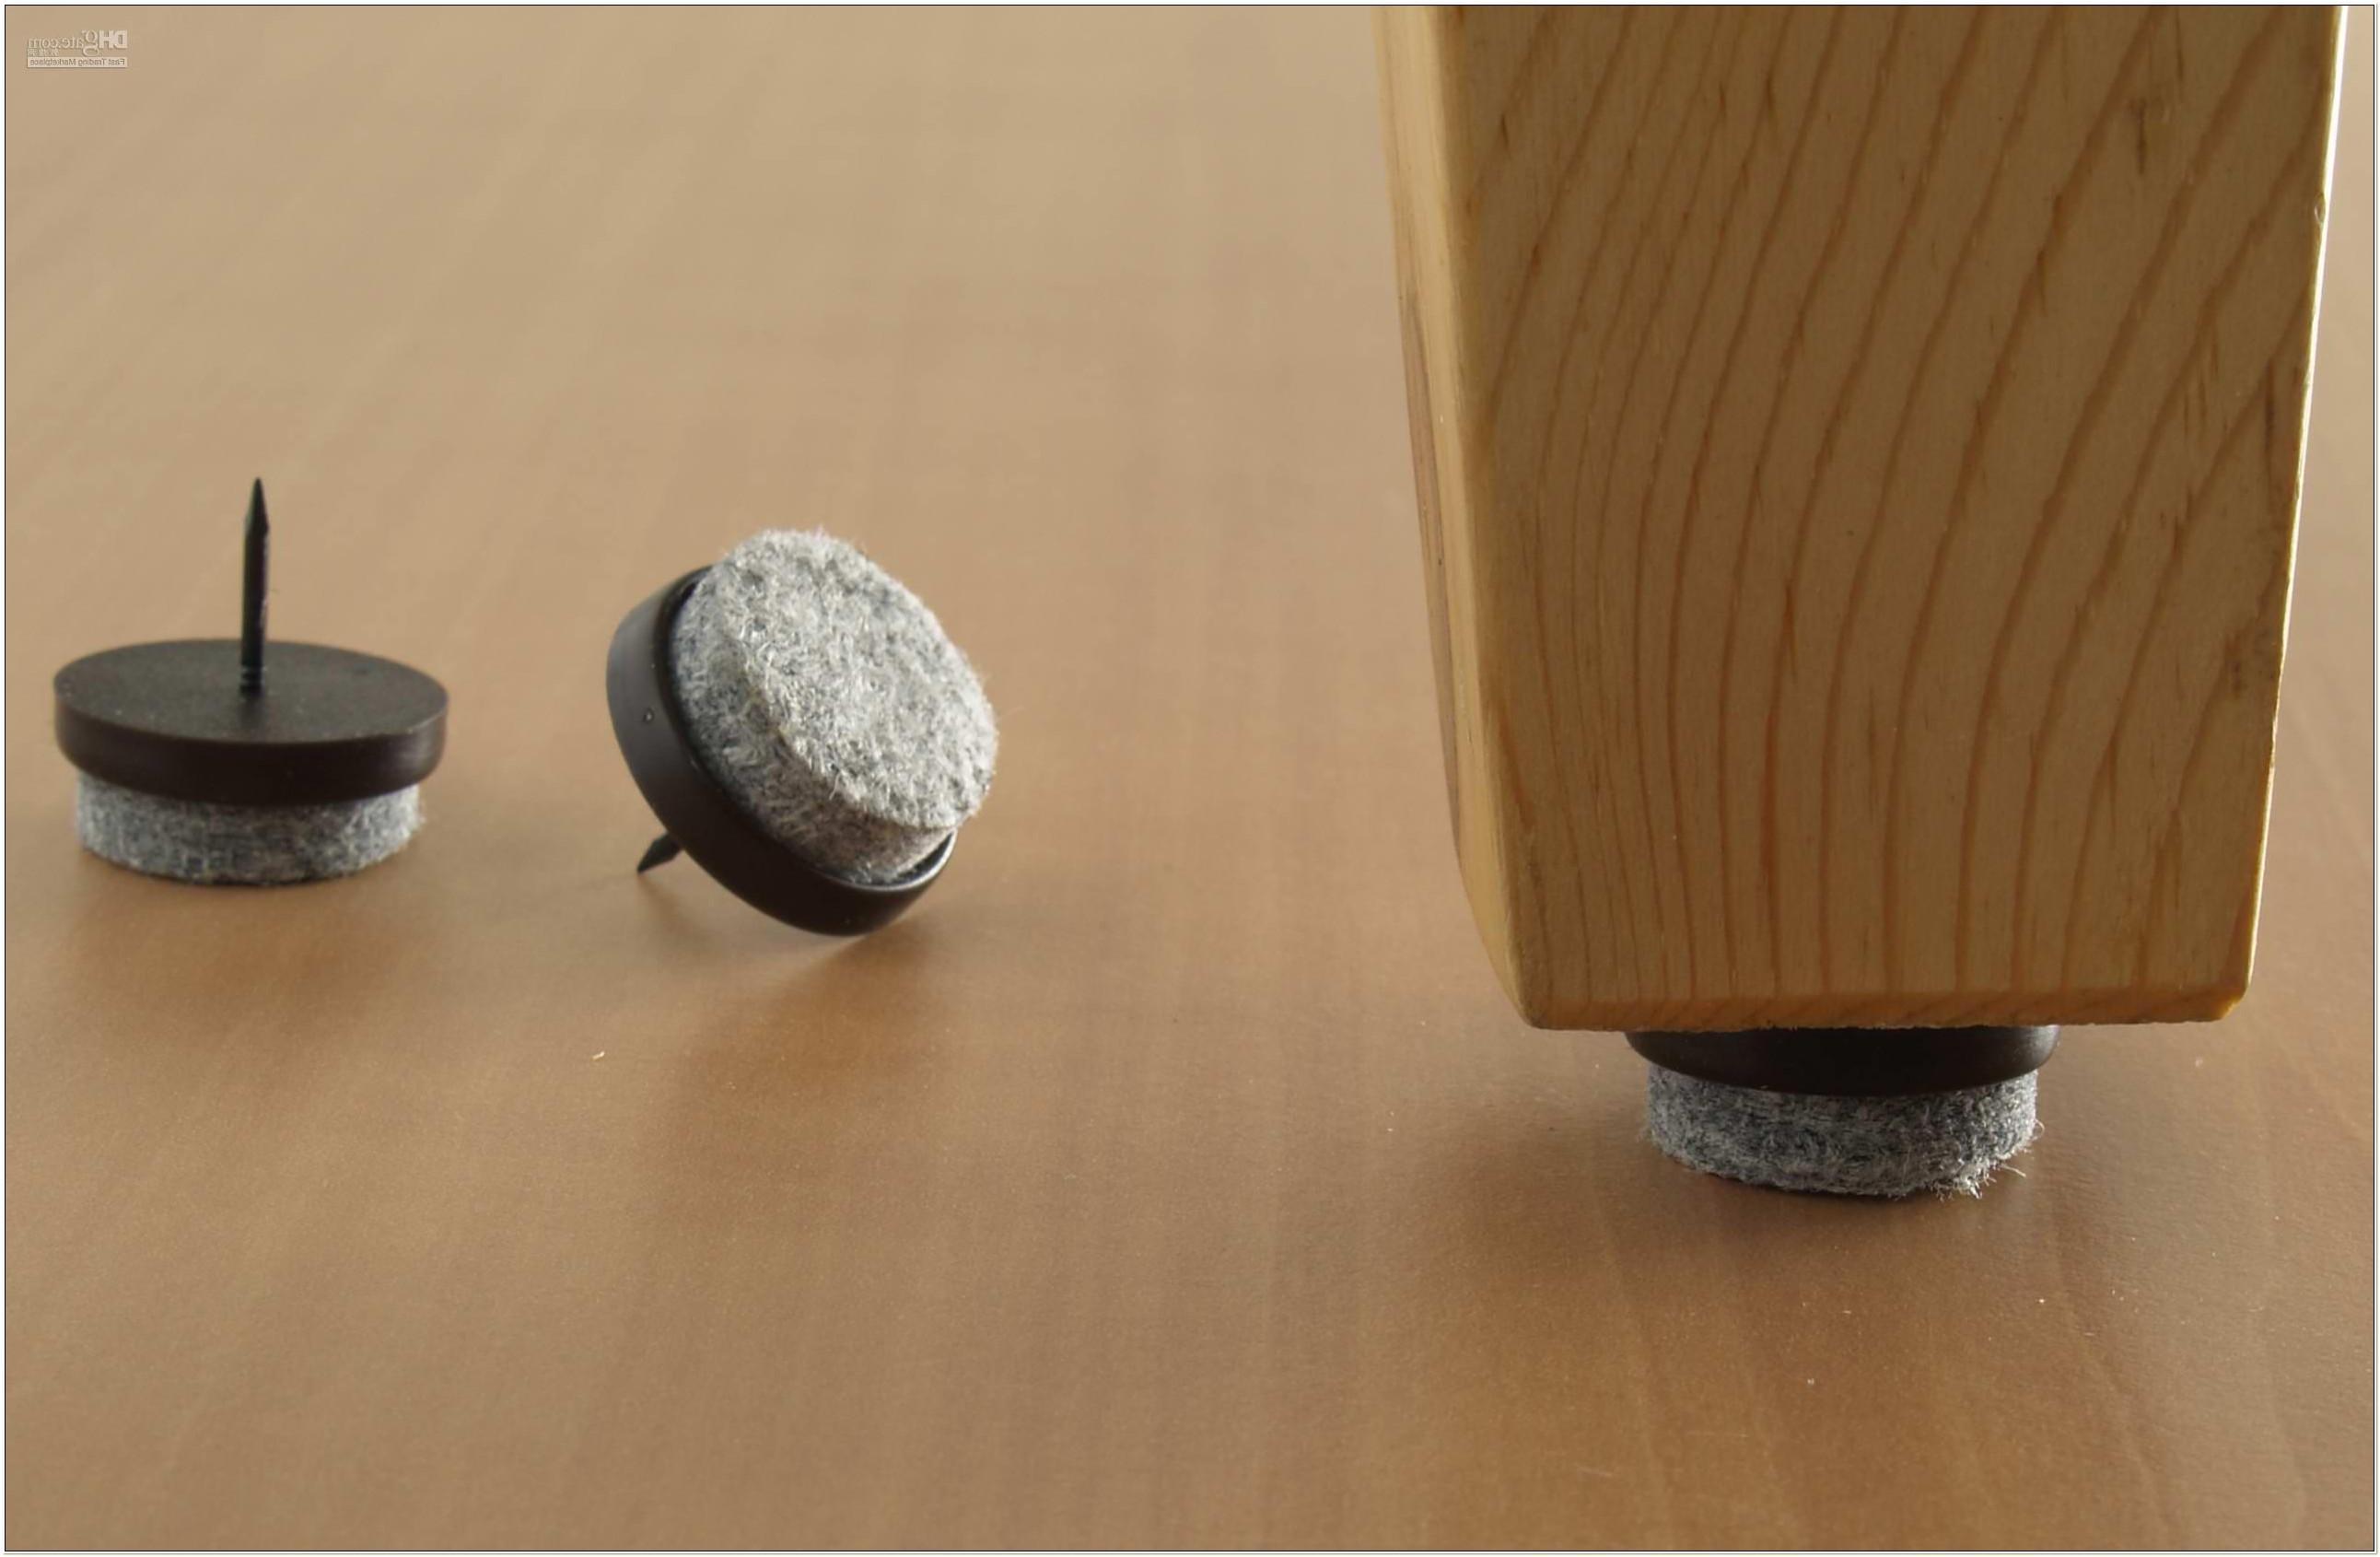 Rubber Chair Leg Protectors For Hardwood Floors